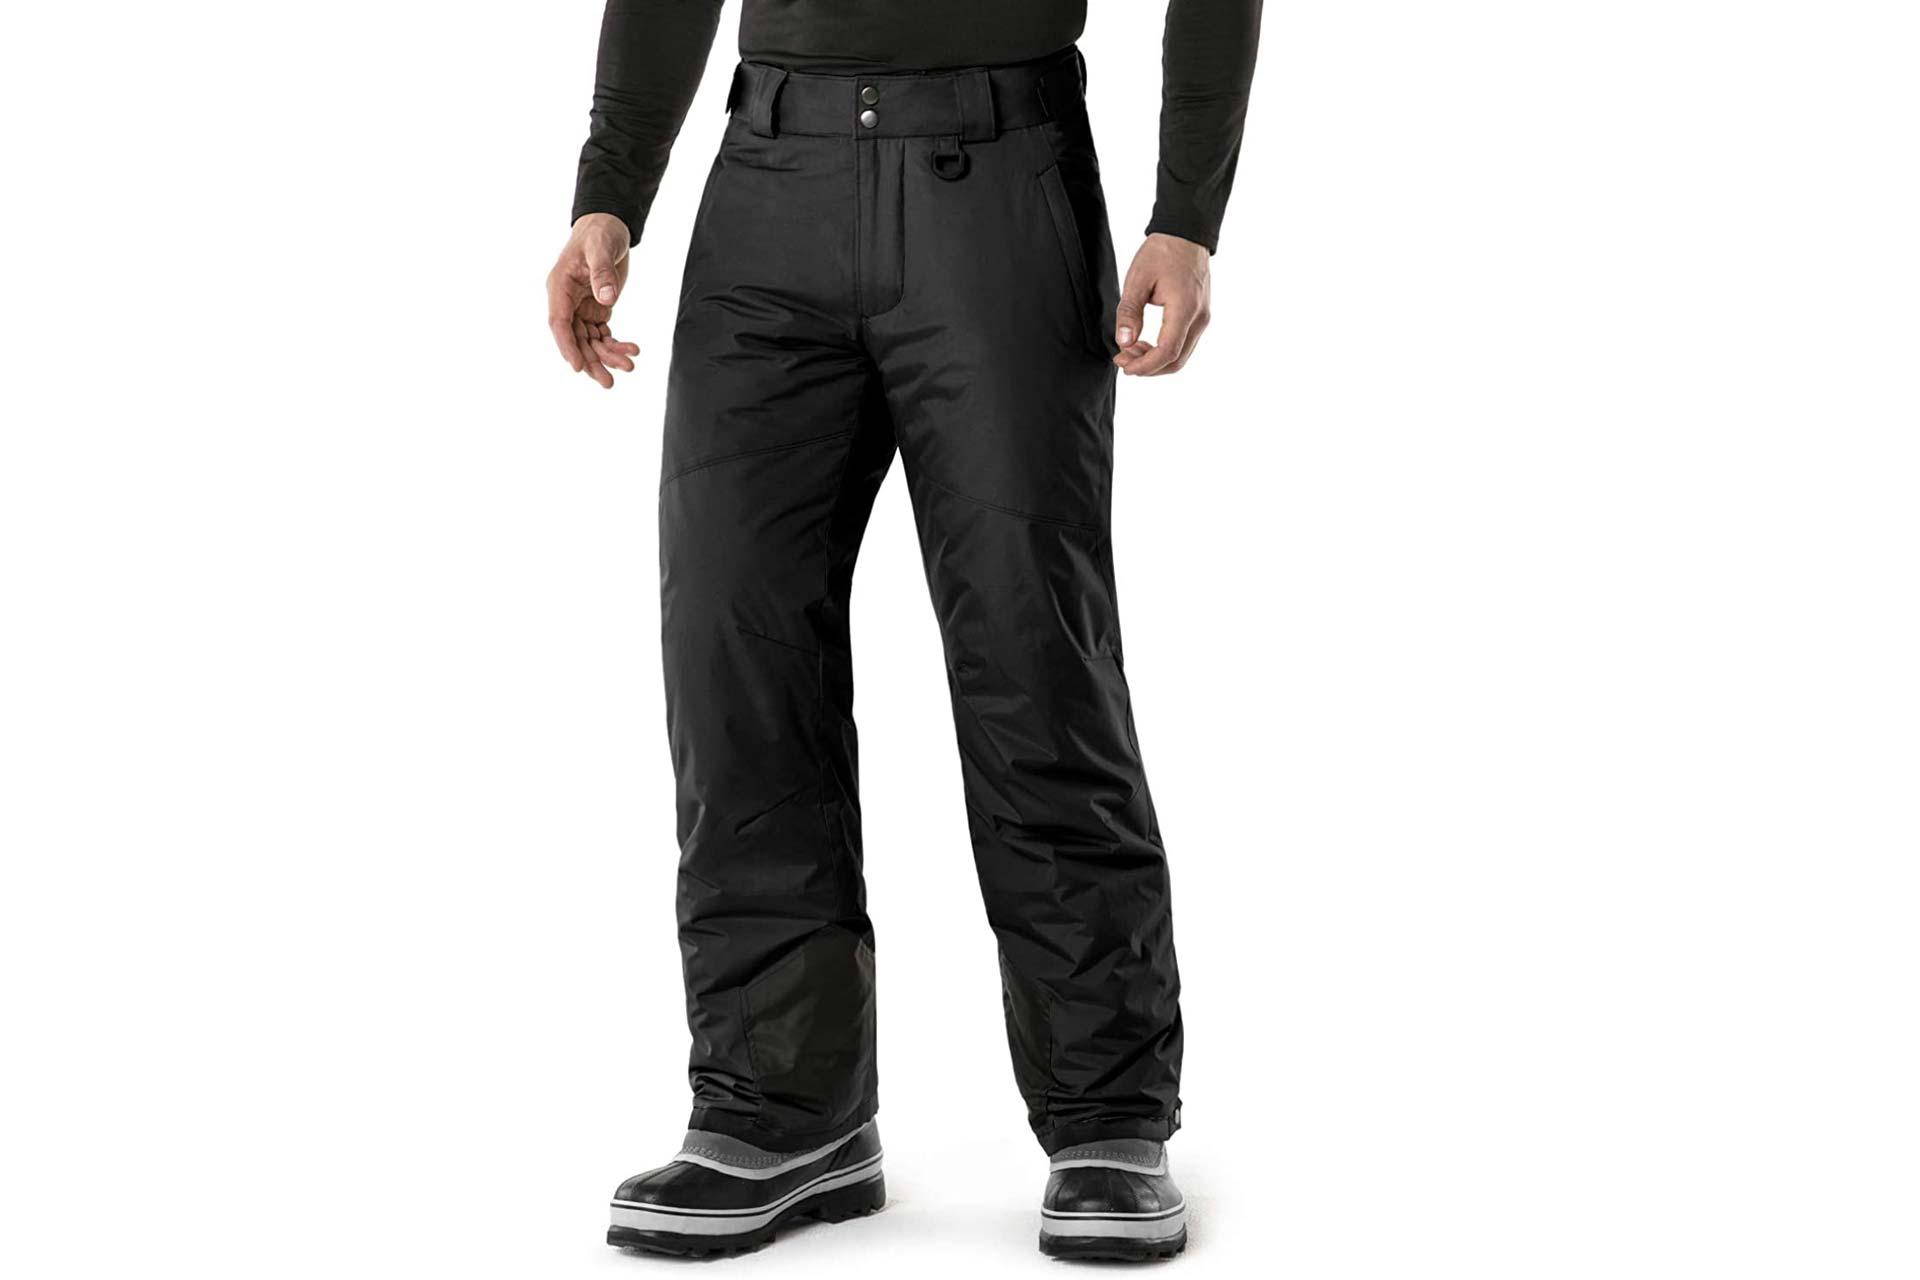 TSLA Men's Winter Snow Pants, Waterproof Insulated Ski Pants, Ripstop Windproof Snowboard Bottoms